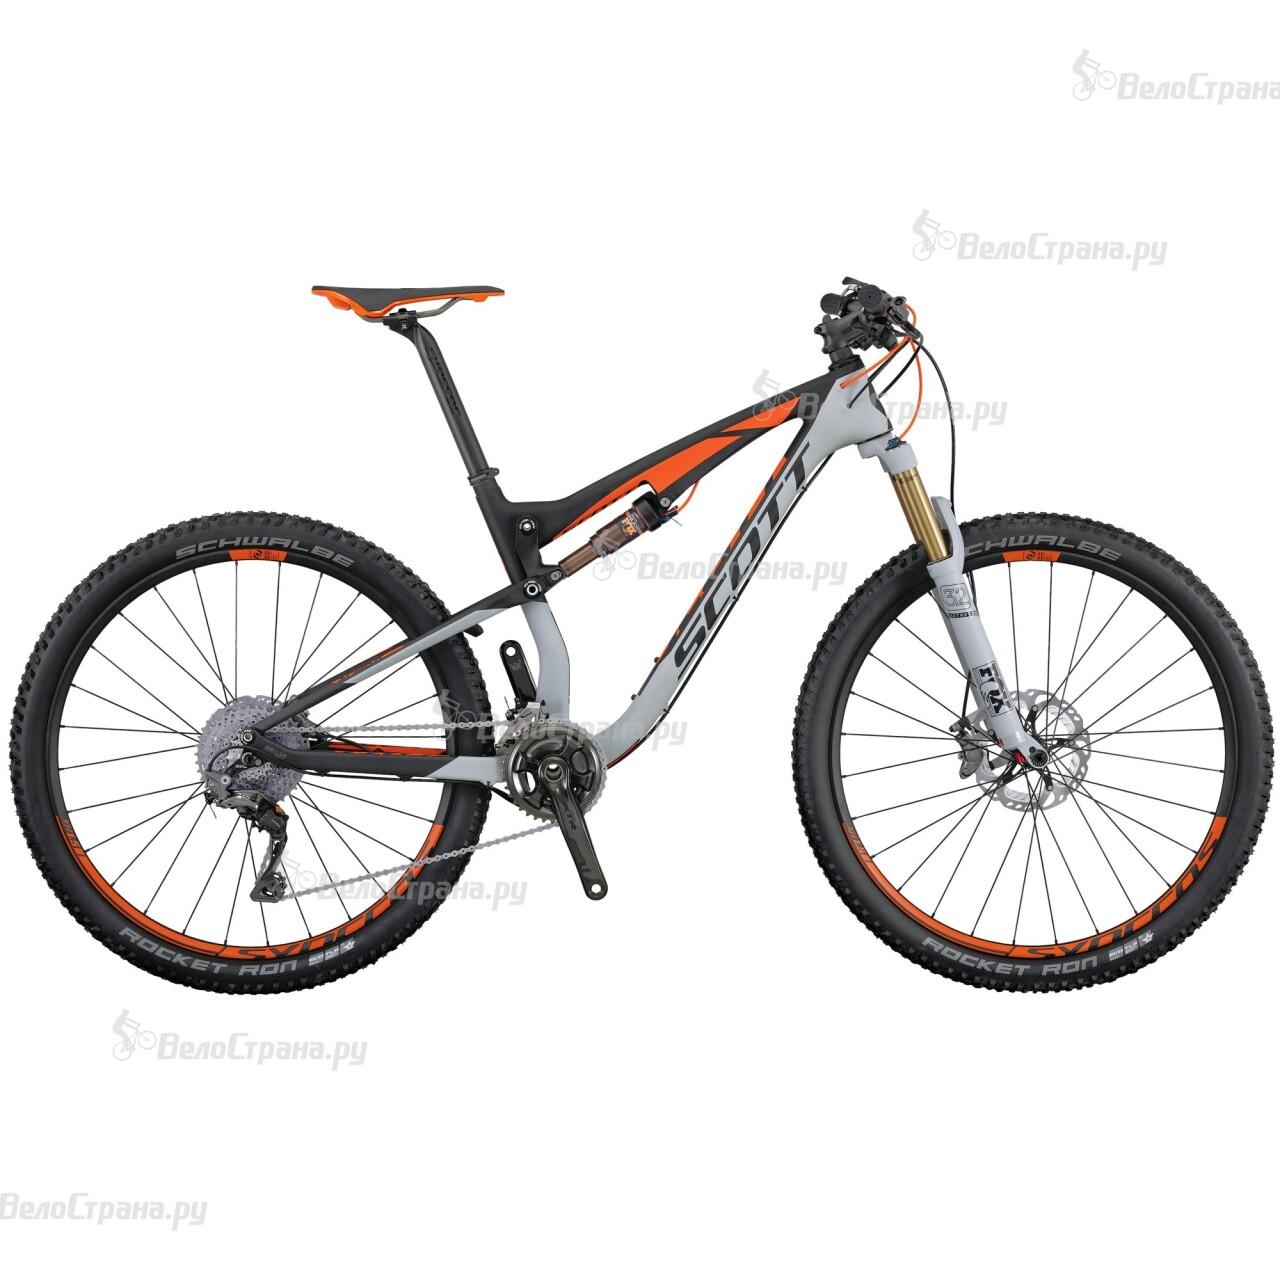 Велосипед Scott Spark 700 Premium (2016) велосипед scott aspect 700 27 5 2016